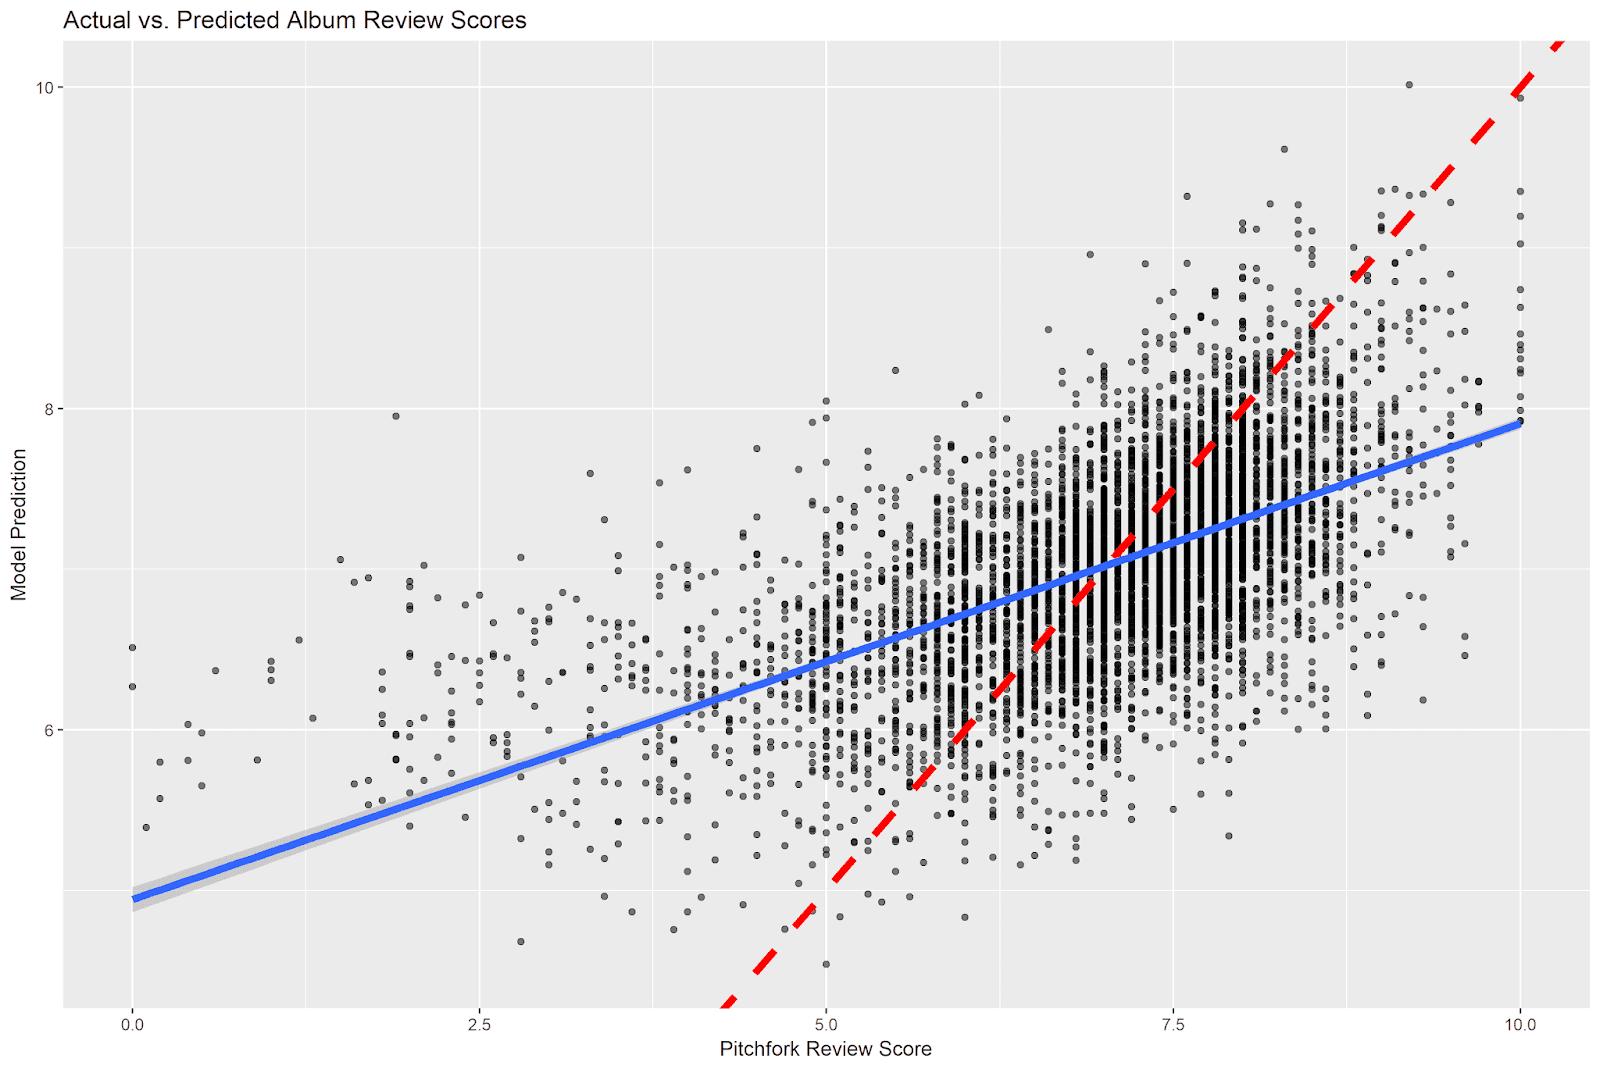 Linguistic Signals of Album Quality: A Predictive Analysis